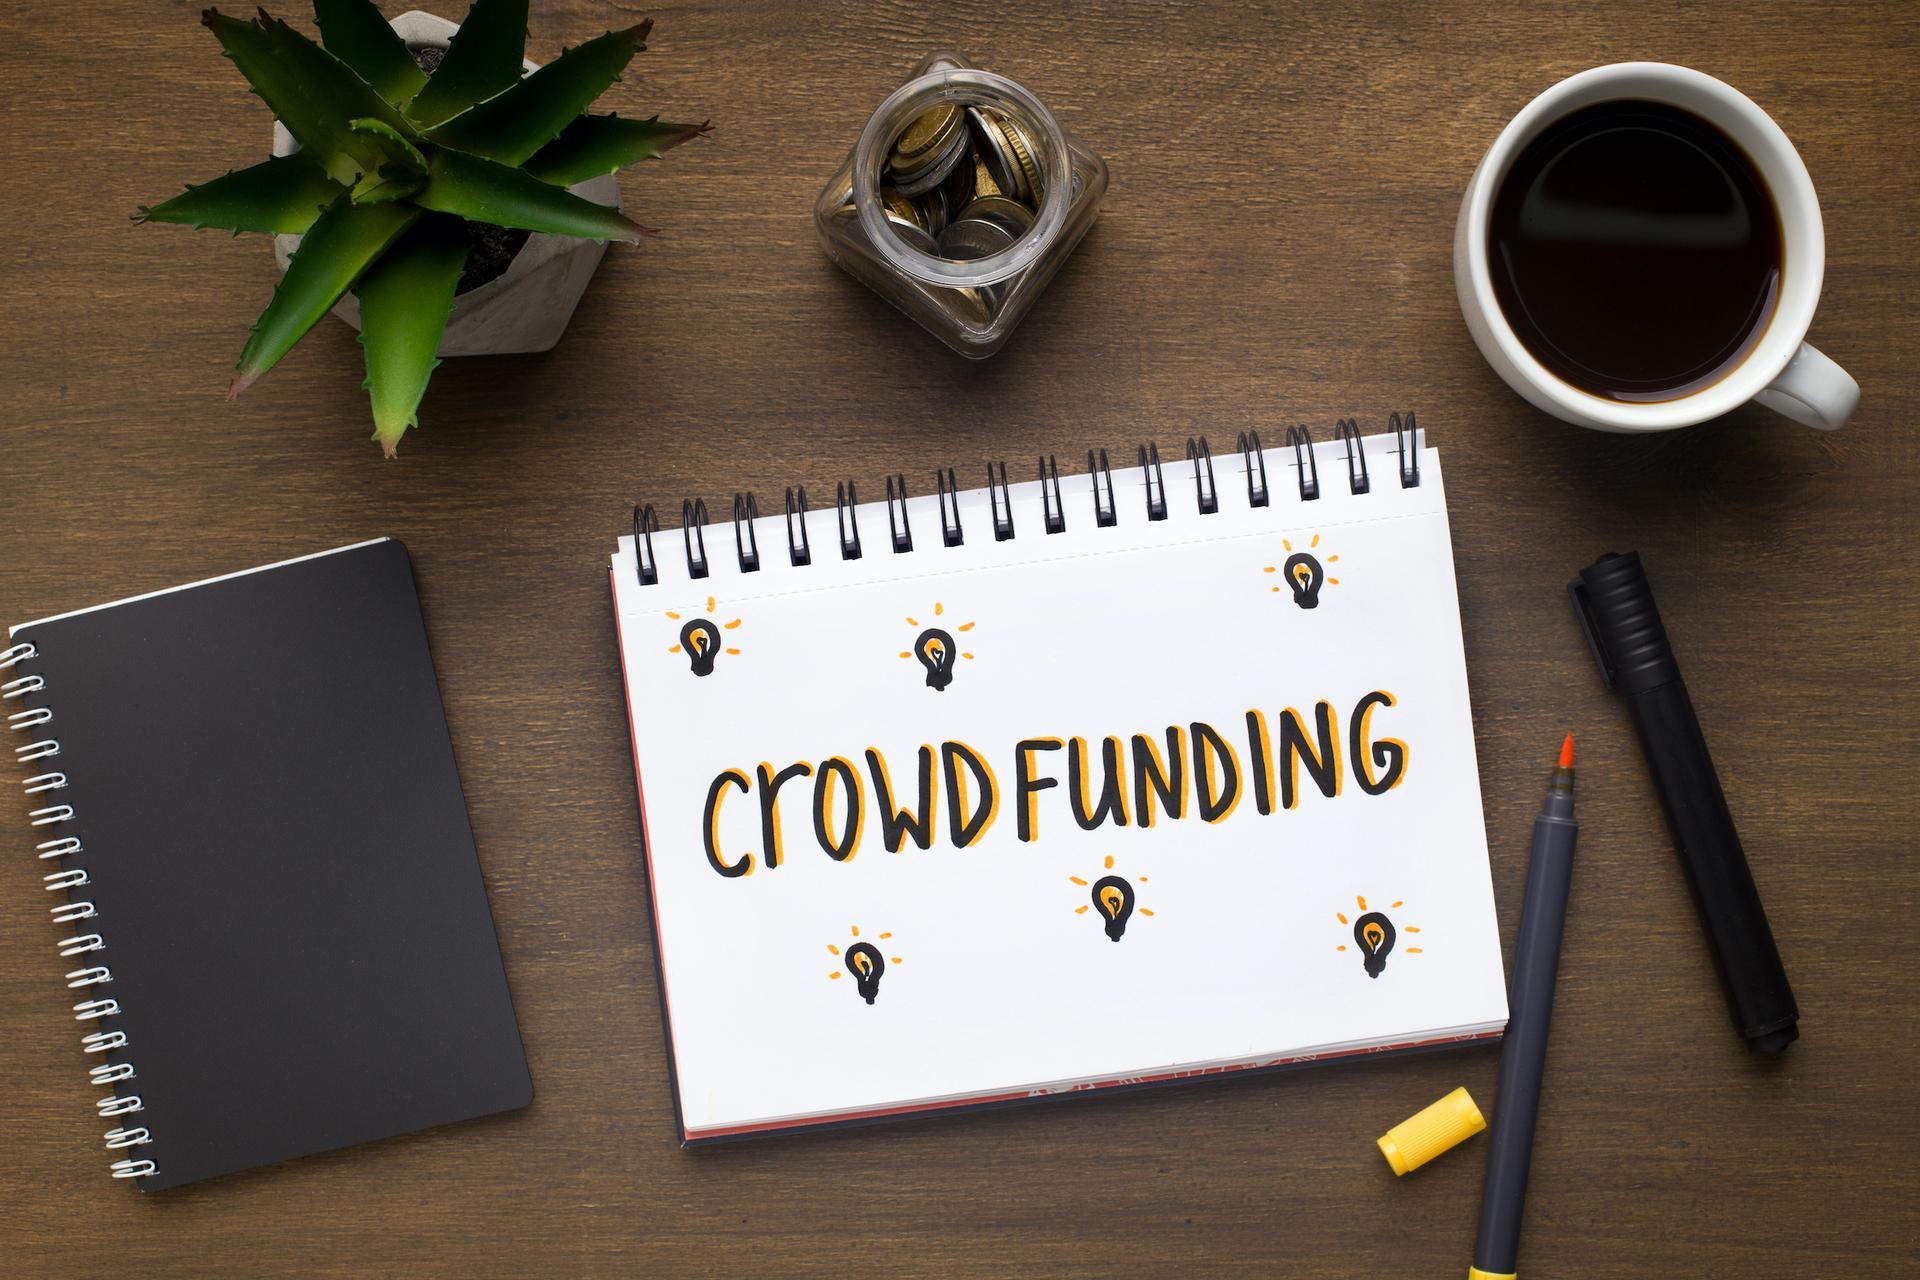 Crowdgfunding Maurizio Bellante